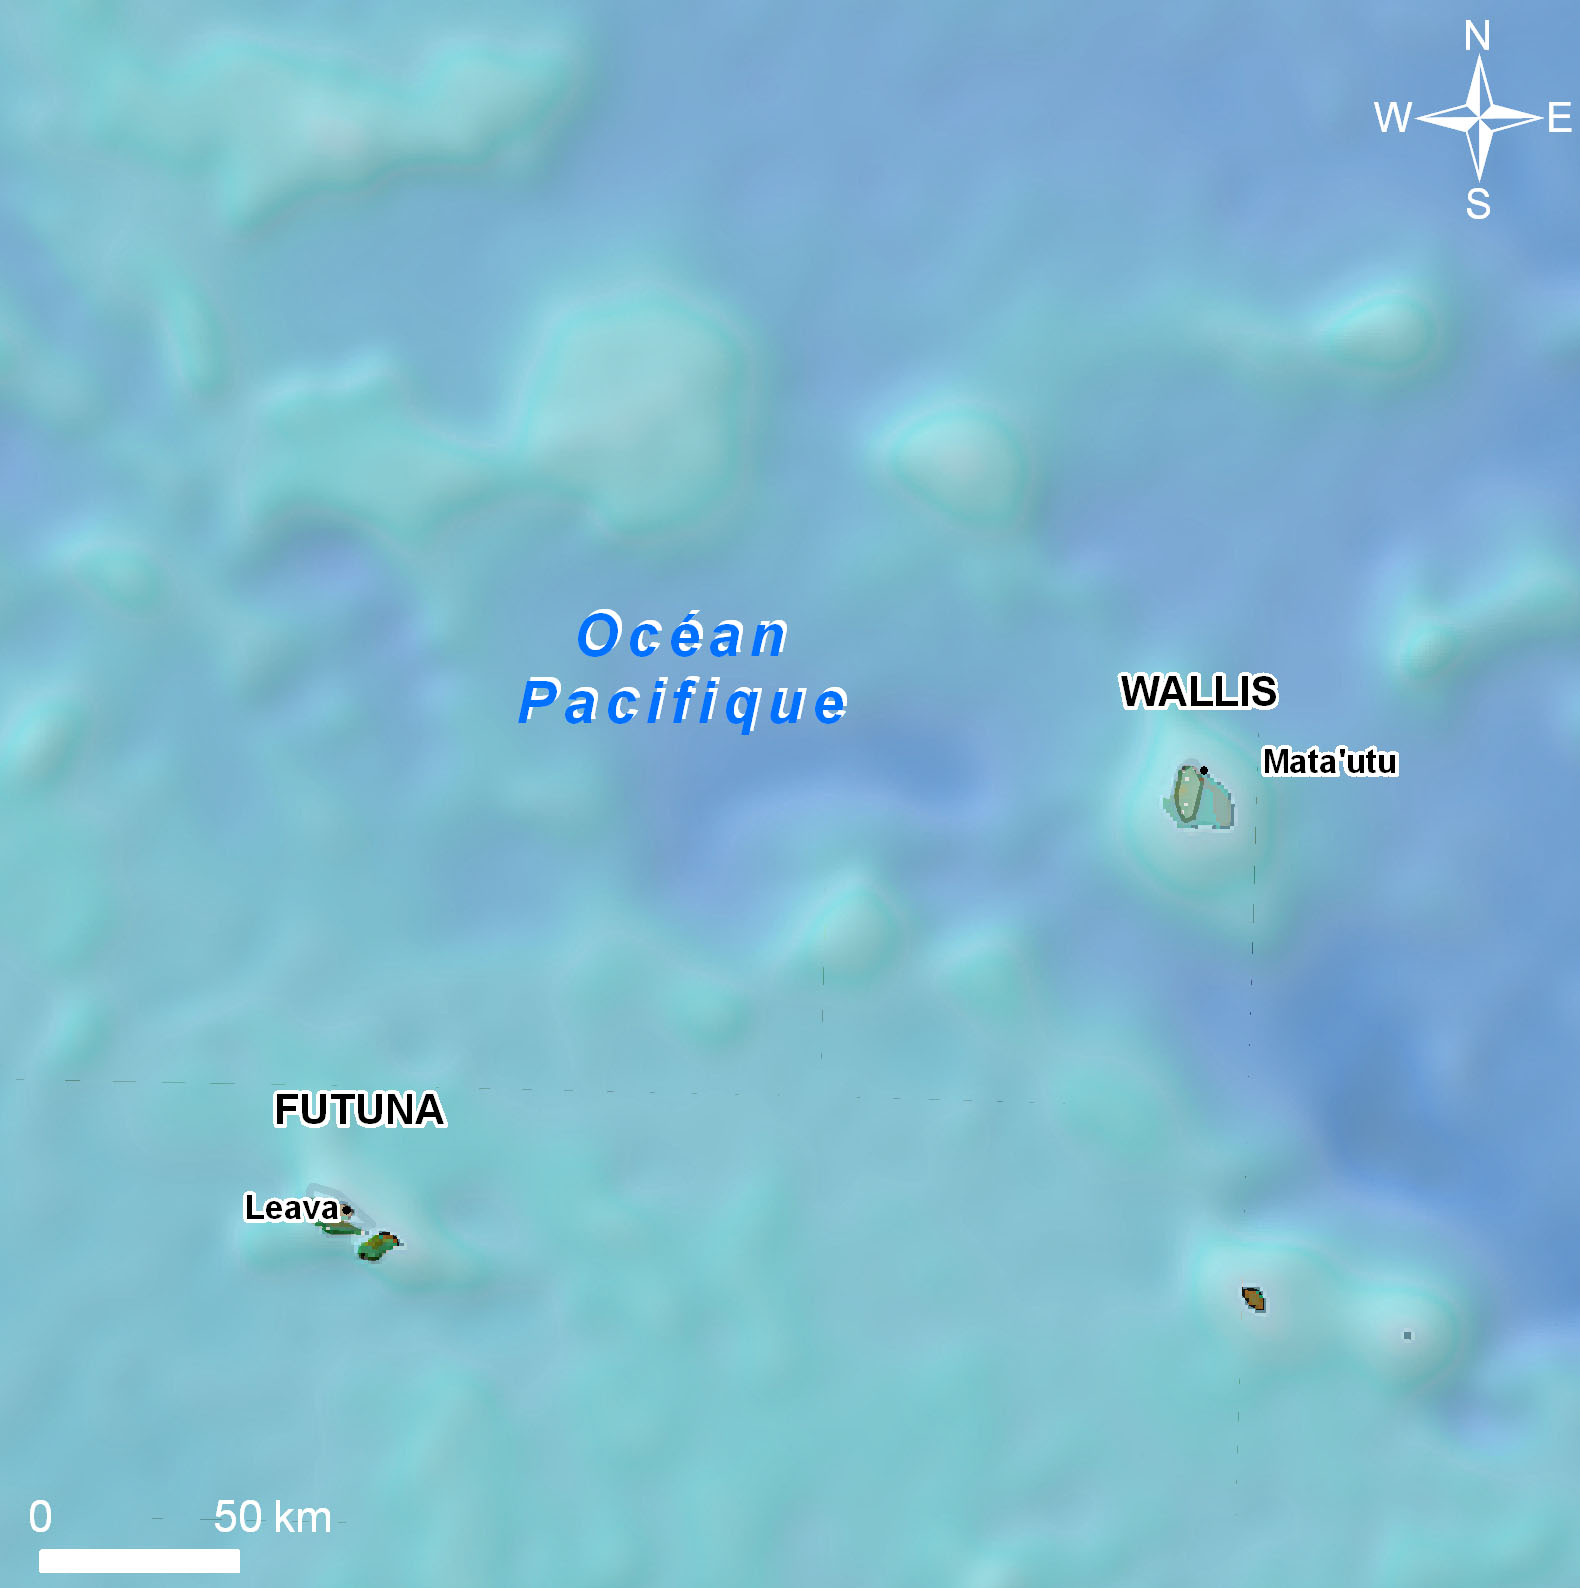 Wallis Island Futuna Island TW0F FW0R MAP